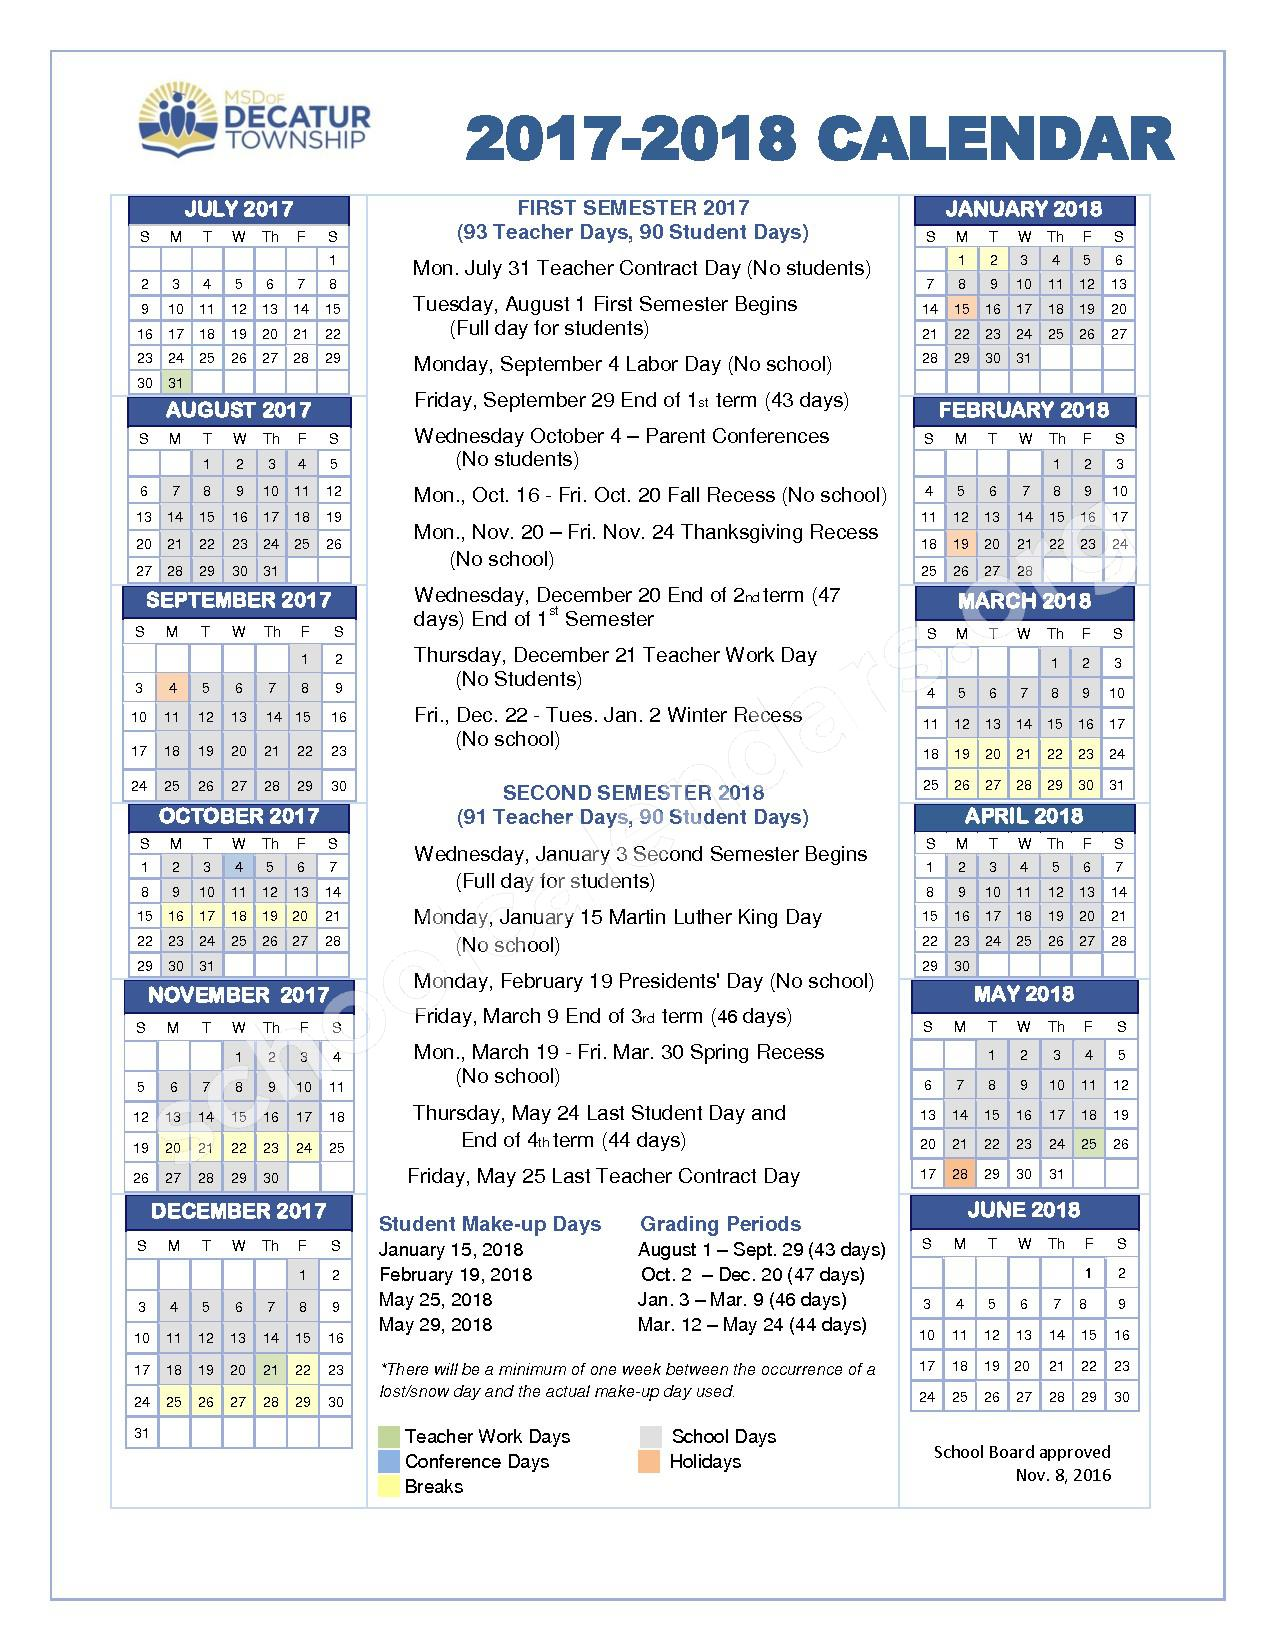 2017 - 2018 School Calendar (PDF) – Metropolitan School District Decatur Township – page 1